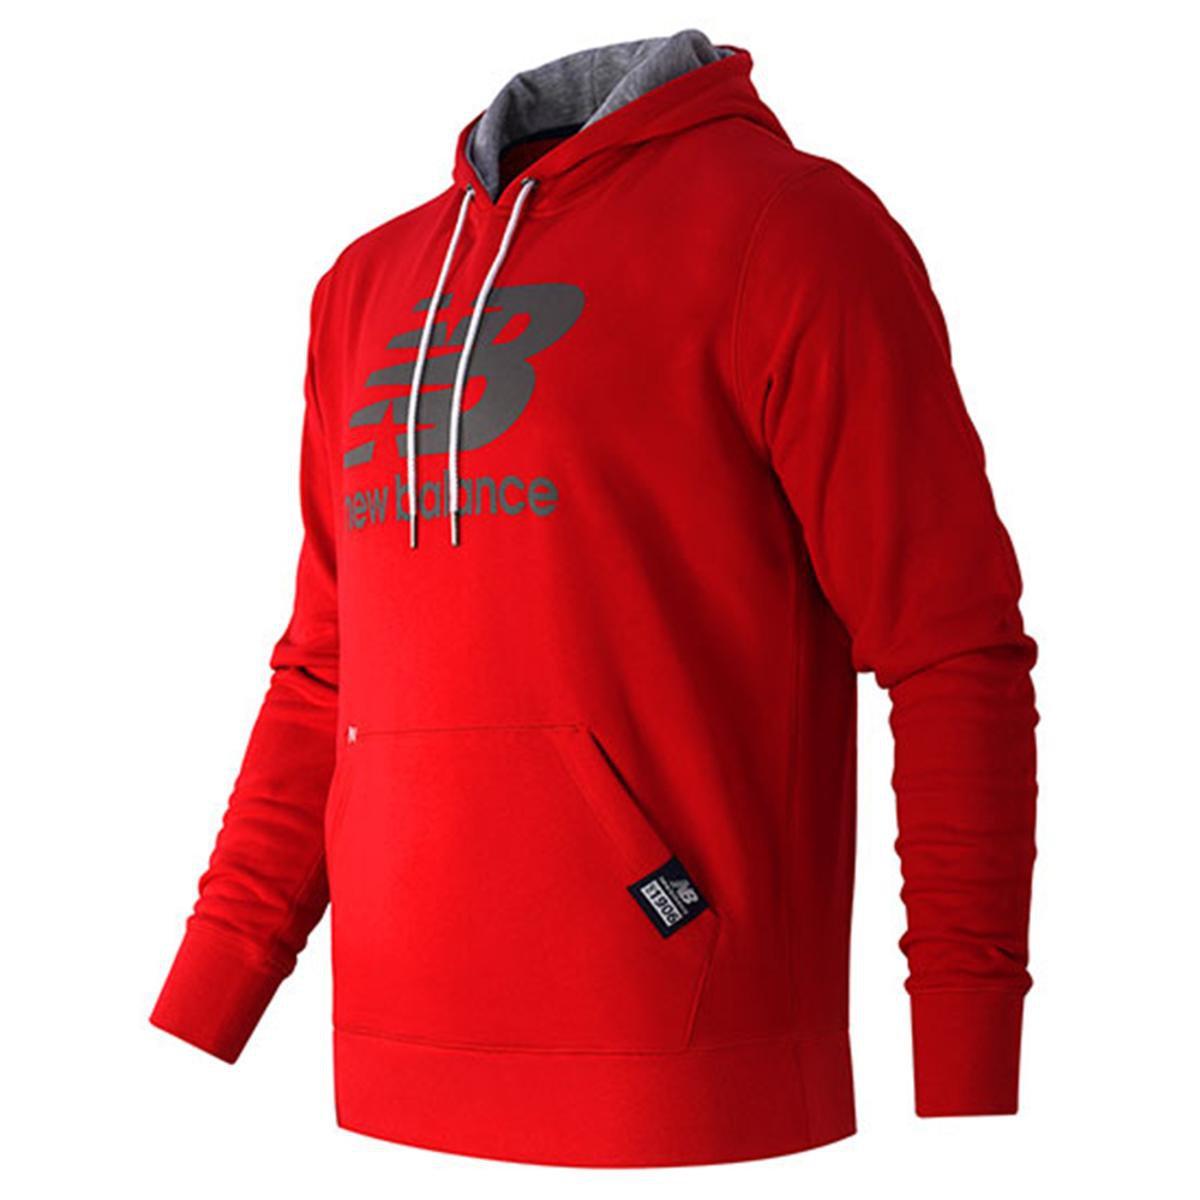 b26343314ad Moletom New Balance Pullover Hoodie Masculino - Compre Agora